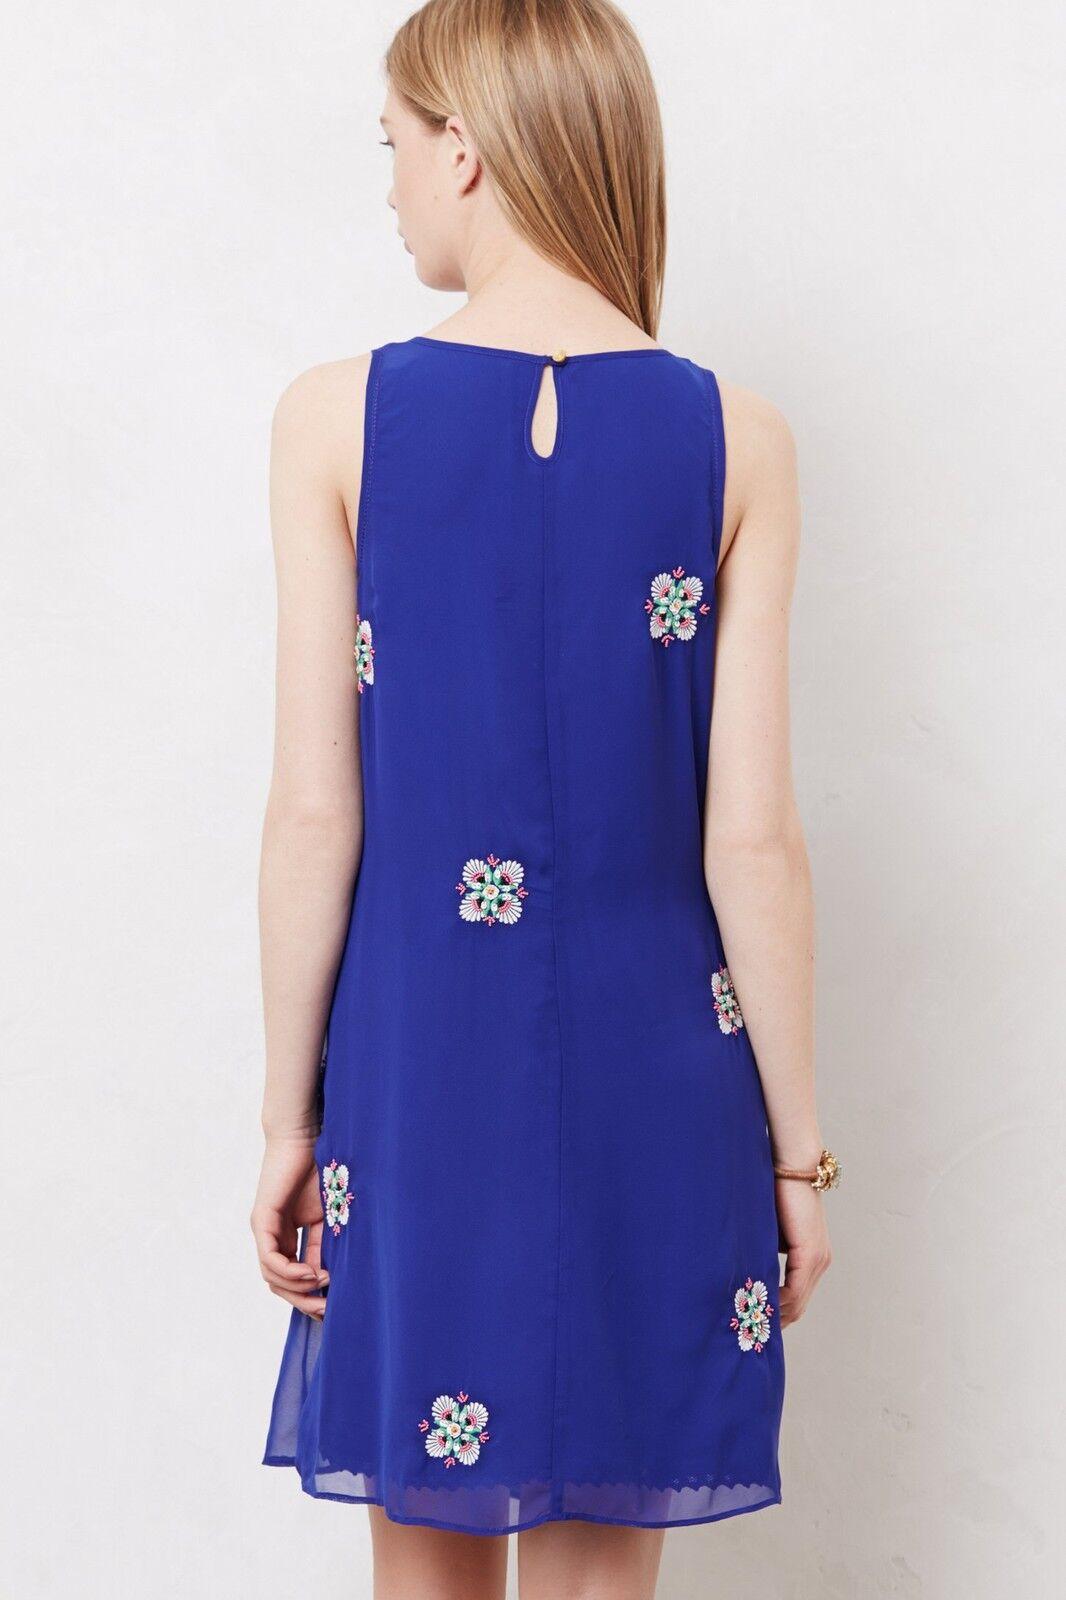 NWT ANTHROPOLOGIE LEIFSDOTTIR ETHNIC Blau Weiß SEQUIN SHIFT DRESS 10 6 38